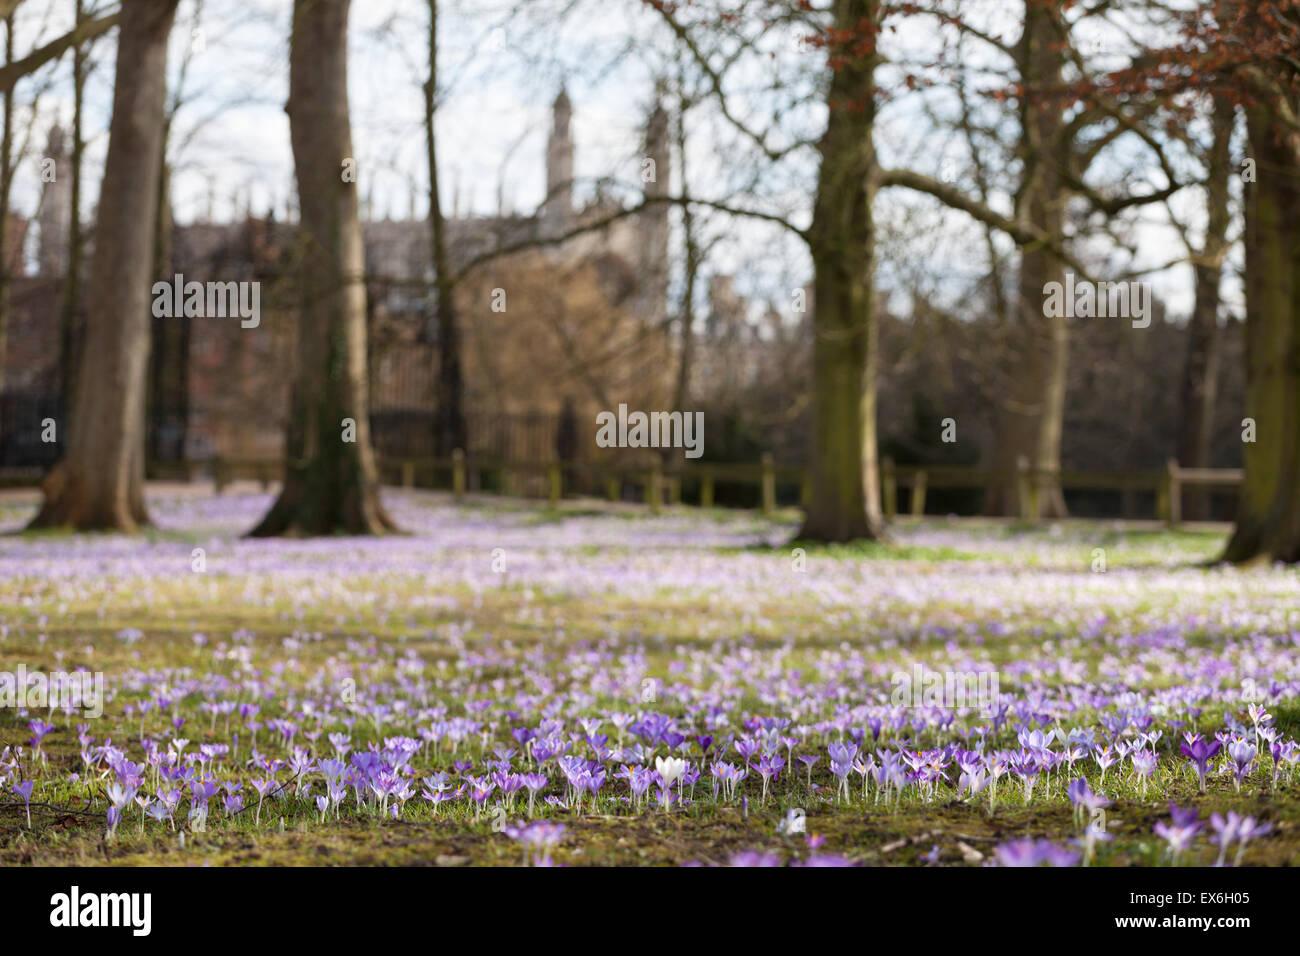 Frühling auf dem Rücken lila Krokus außen Trinity College Cambridge, UK Stockbild